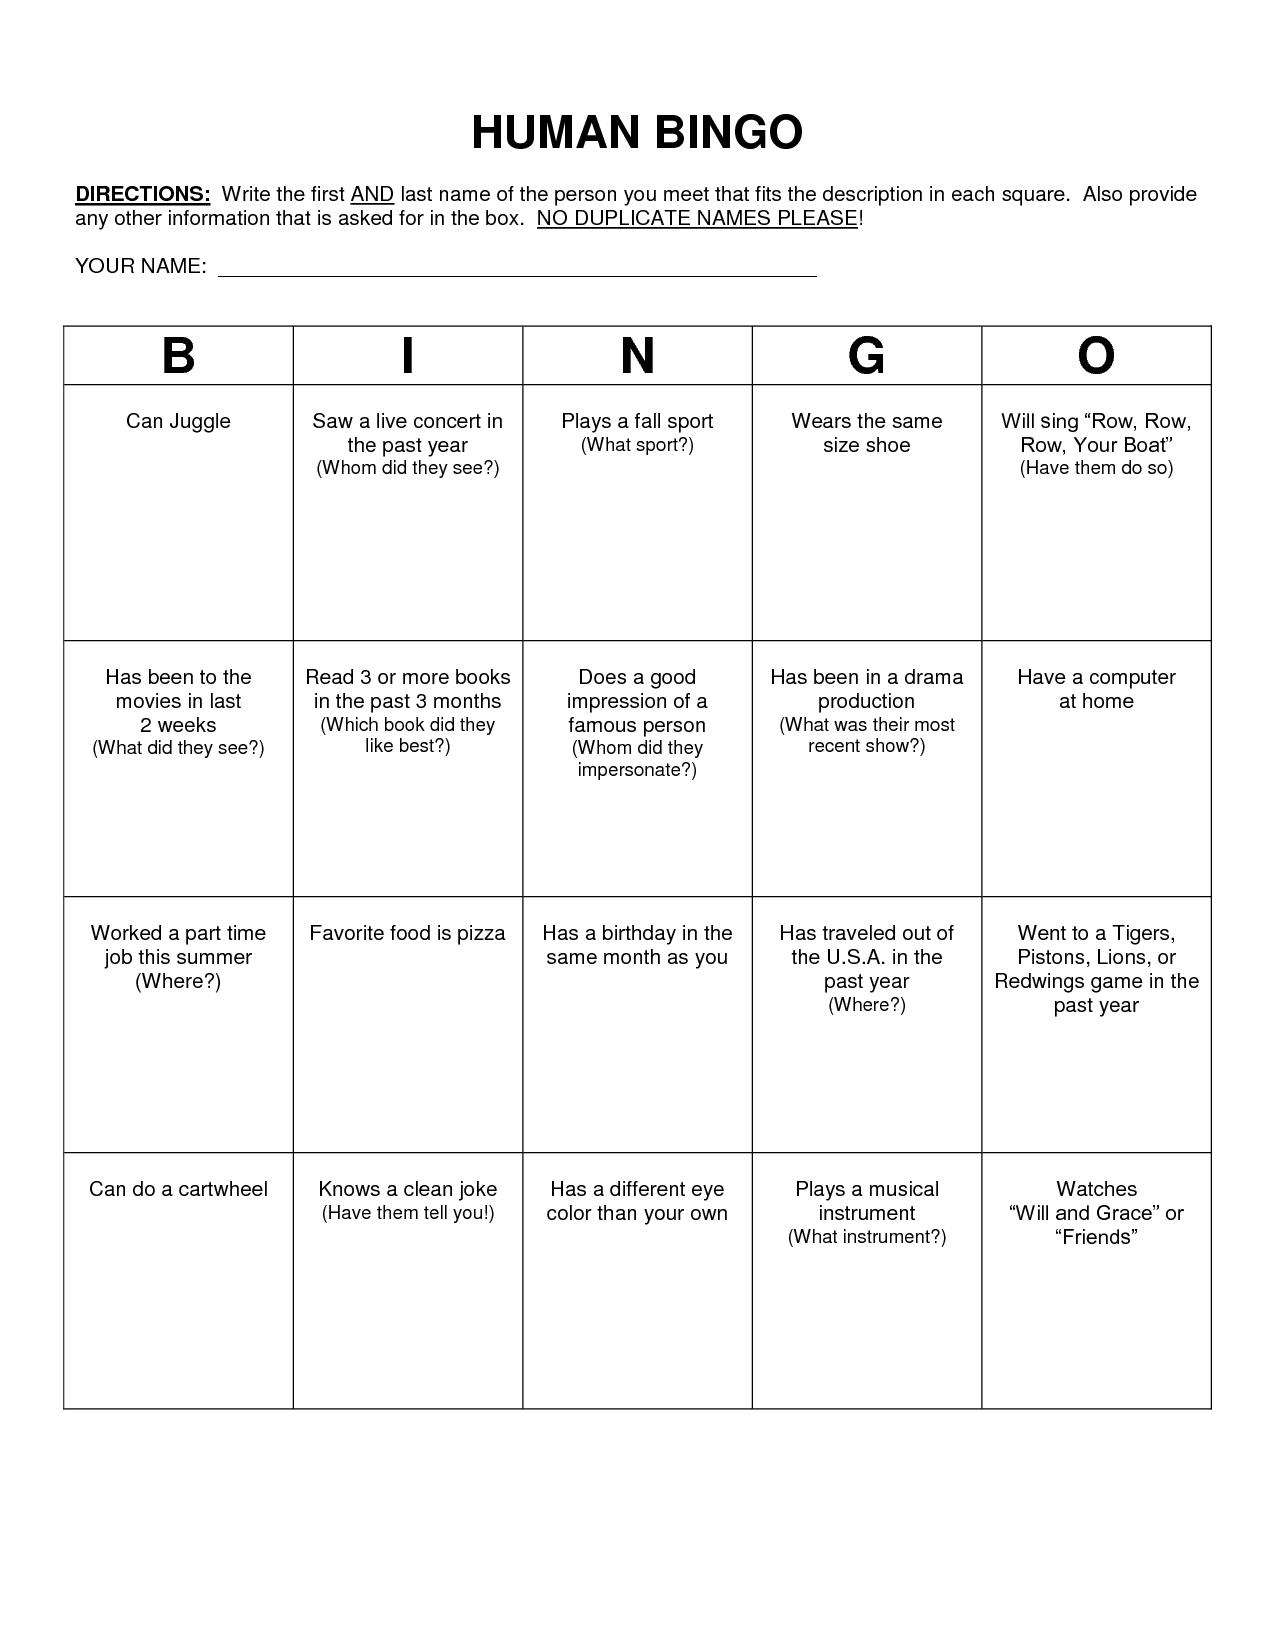 Human Bingo Scavenger Hunt Template  Classroom  Human Bingo Bingo For Blank Bingo Card Template Microsoft Word